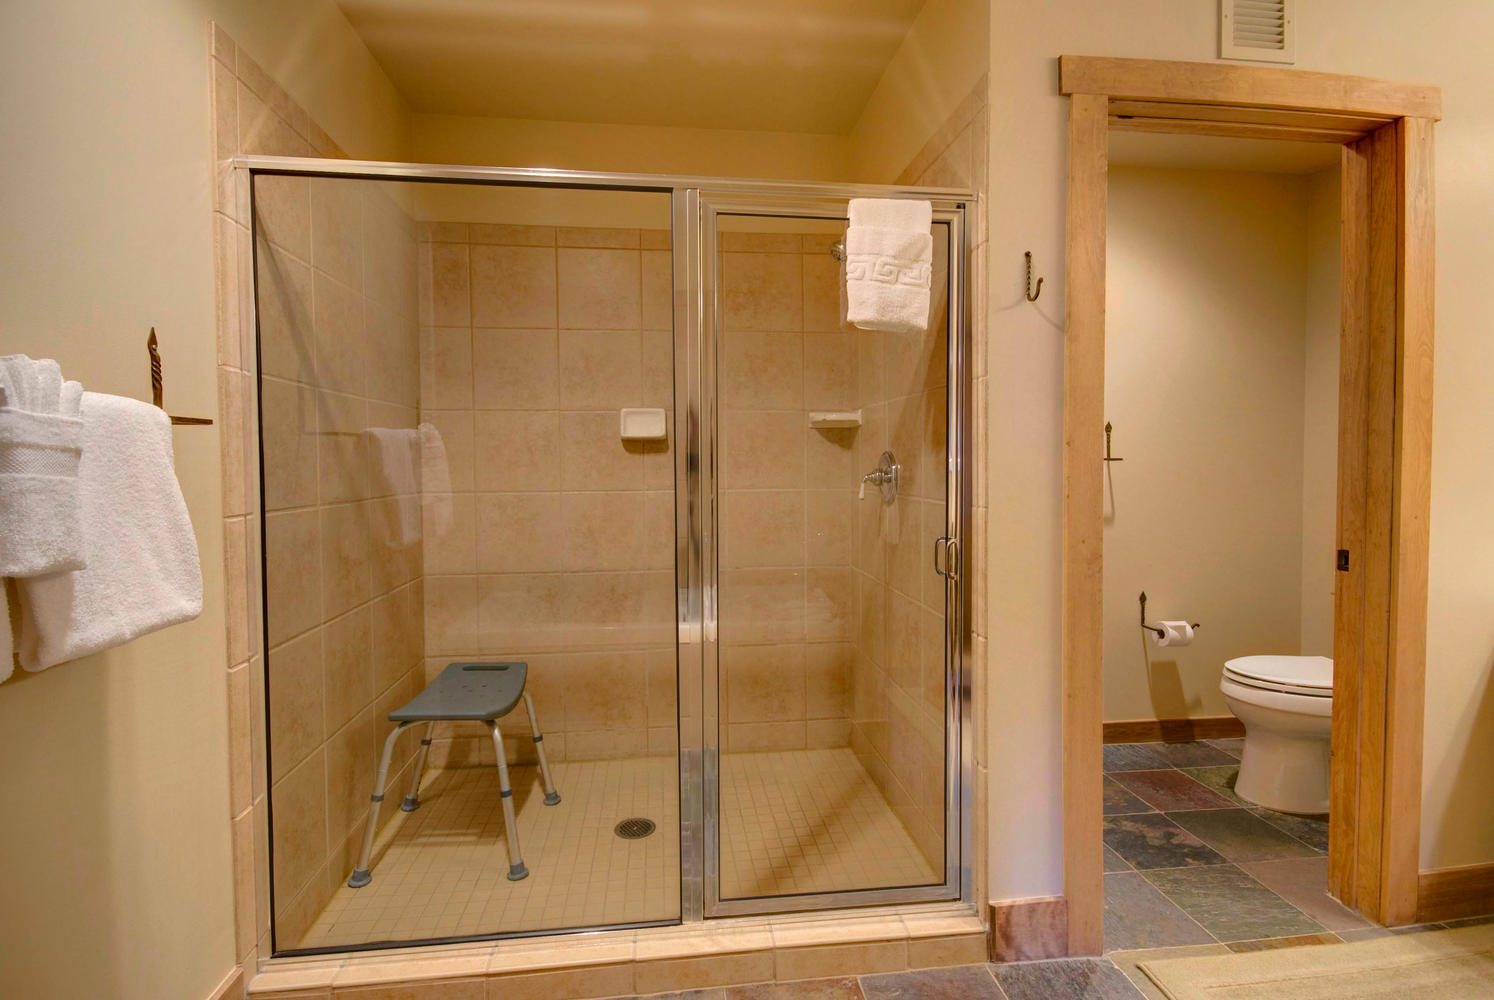 Keystone Condos for Rent | Lodge | Seymour Lodging